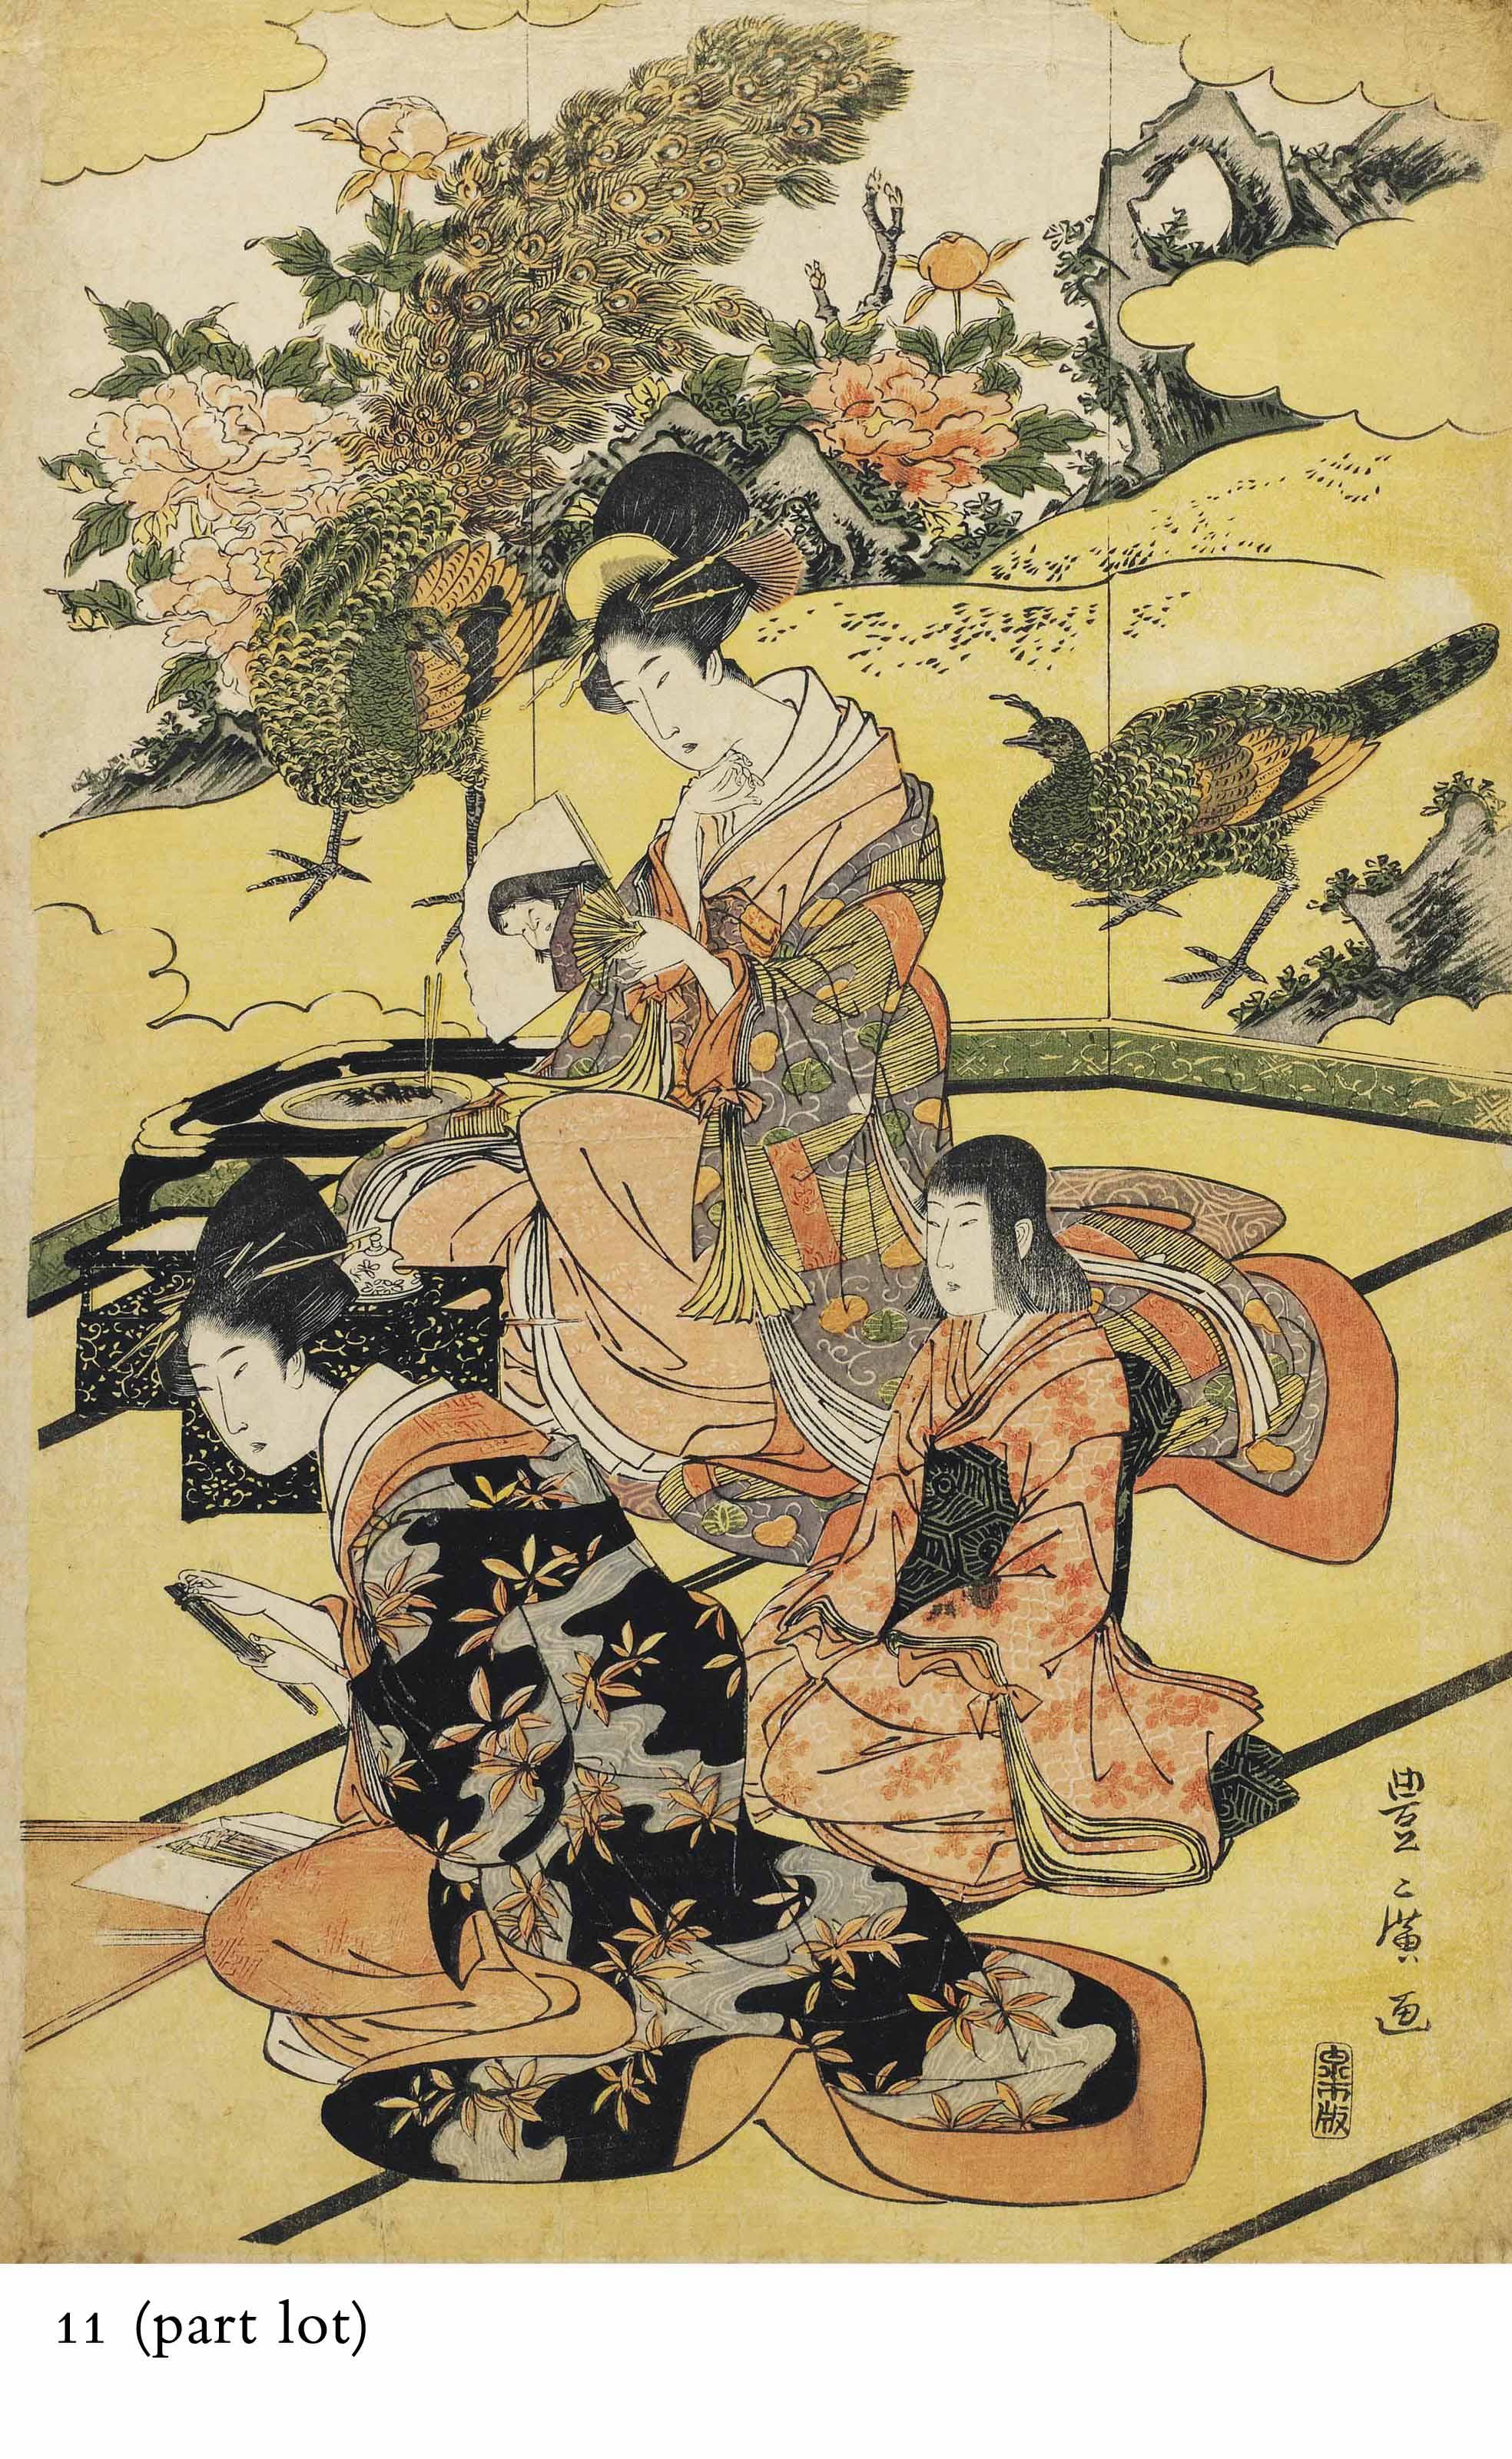 UTAGAWA TOYOHIRO (1773-1828), TORII KIYOMINE (1786-1868) AND OTHERS